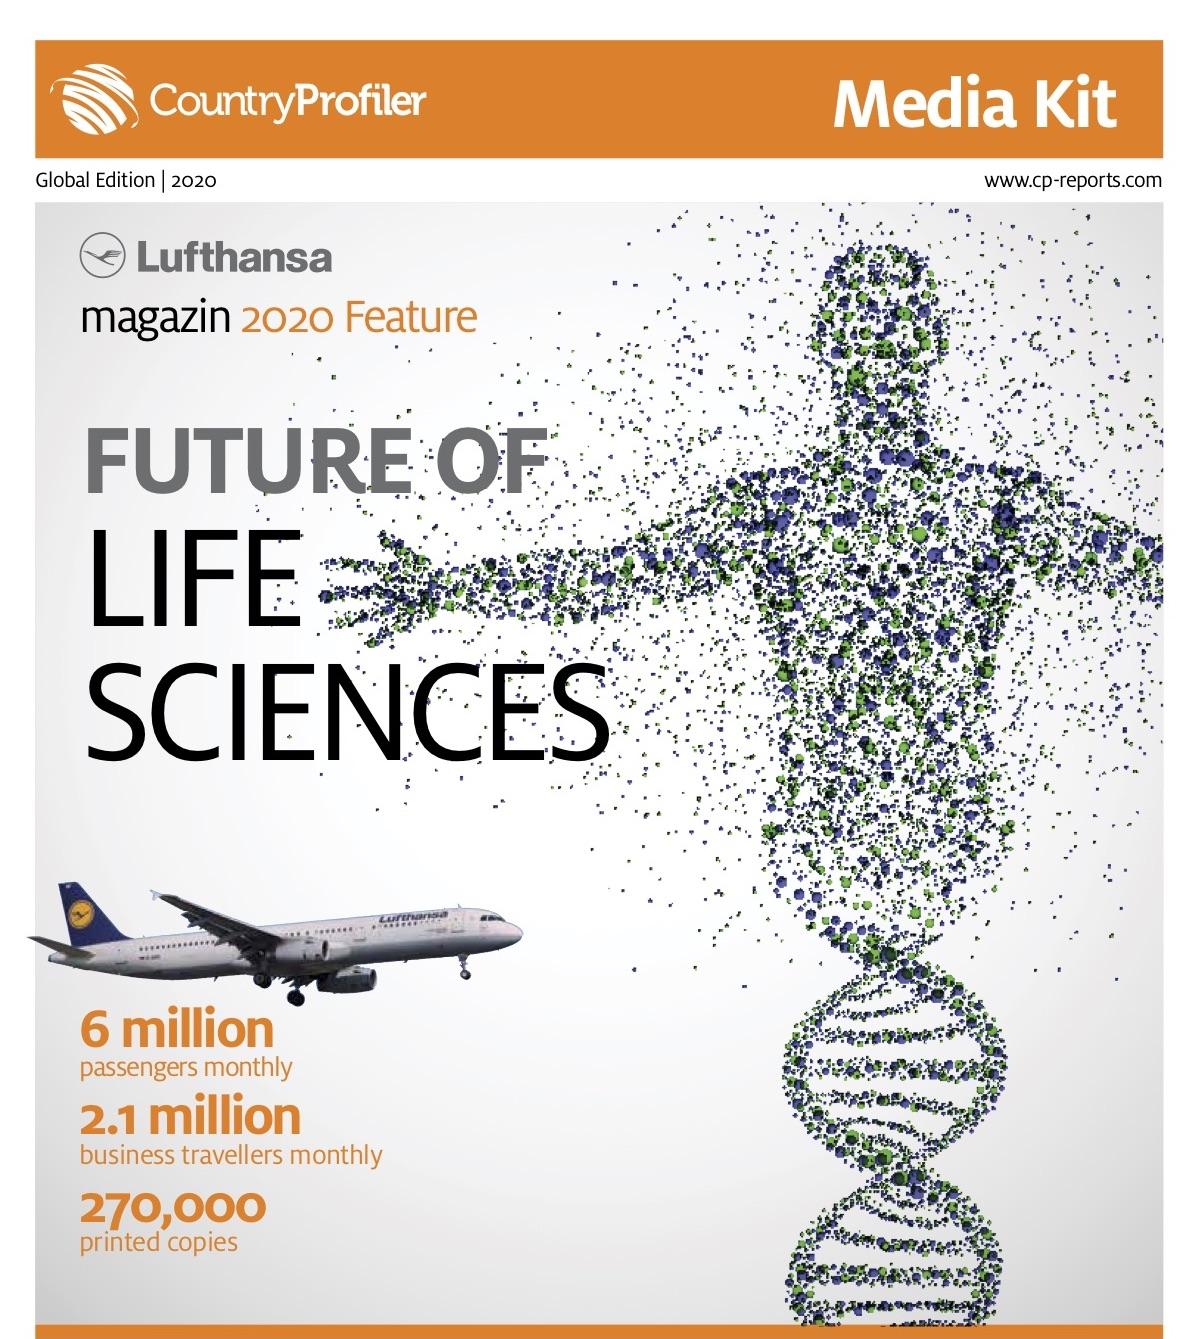 Future of Life Sciences, Lufthansa magazin